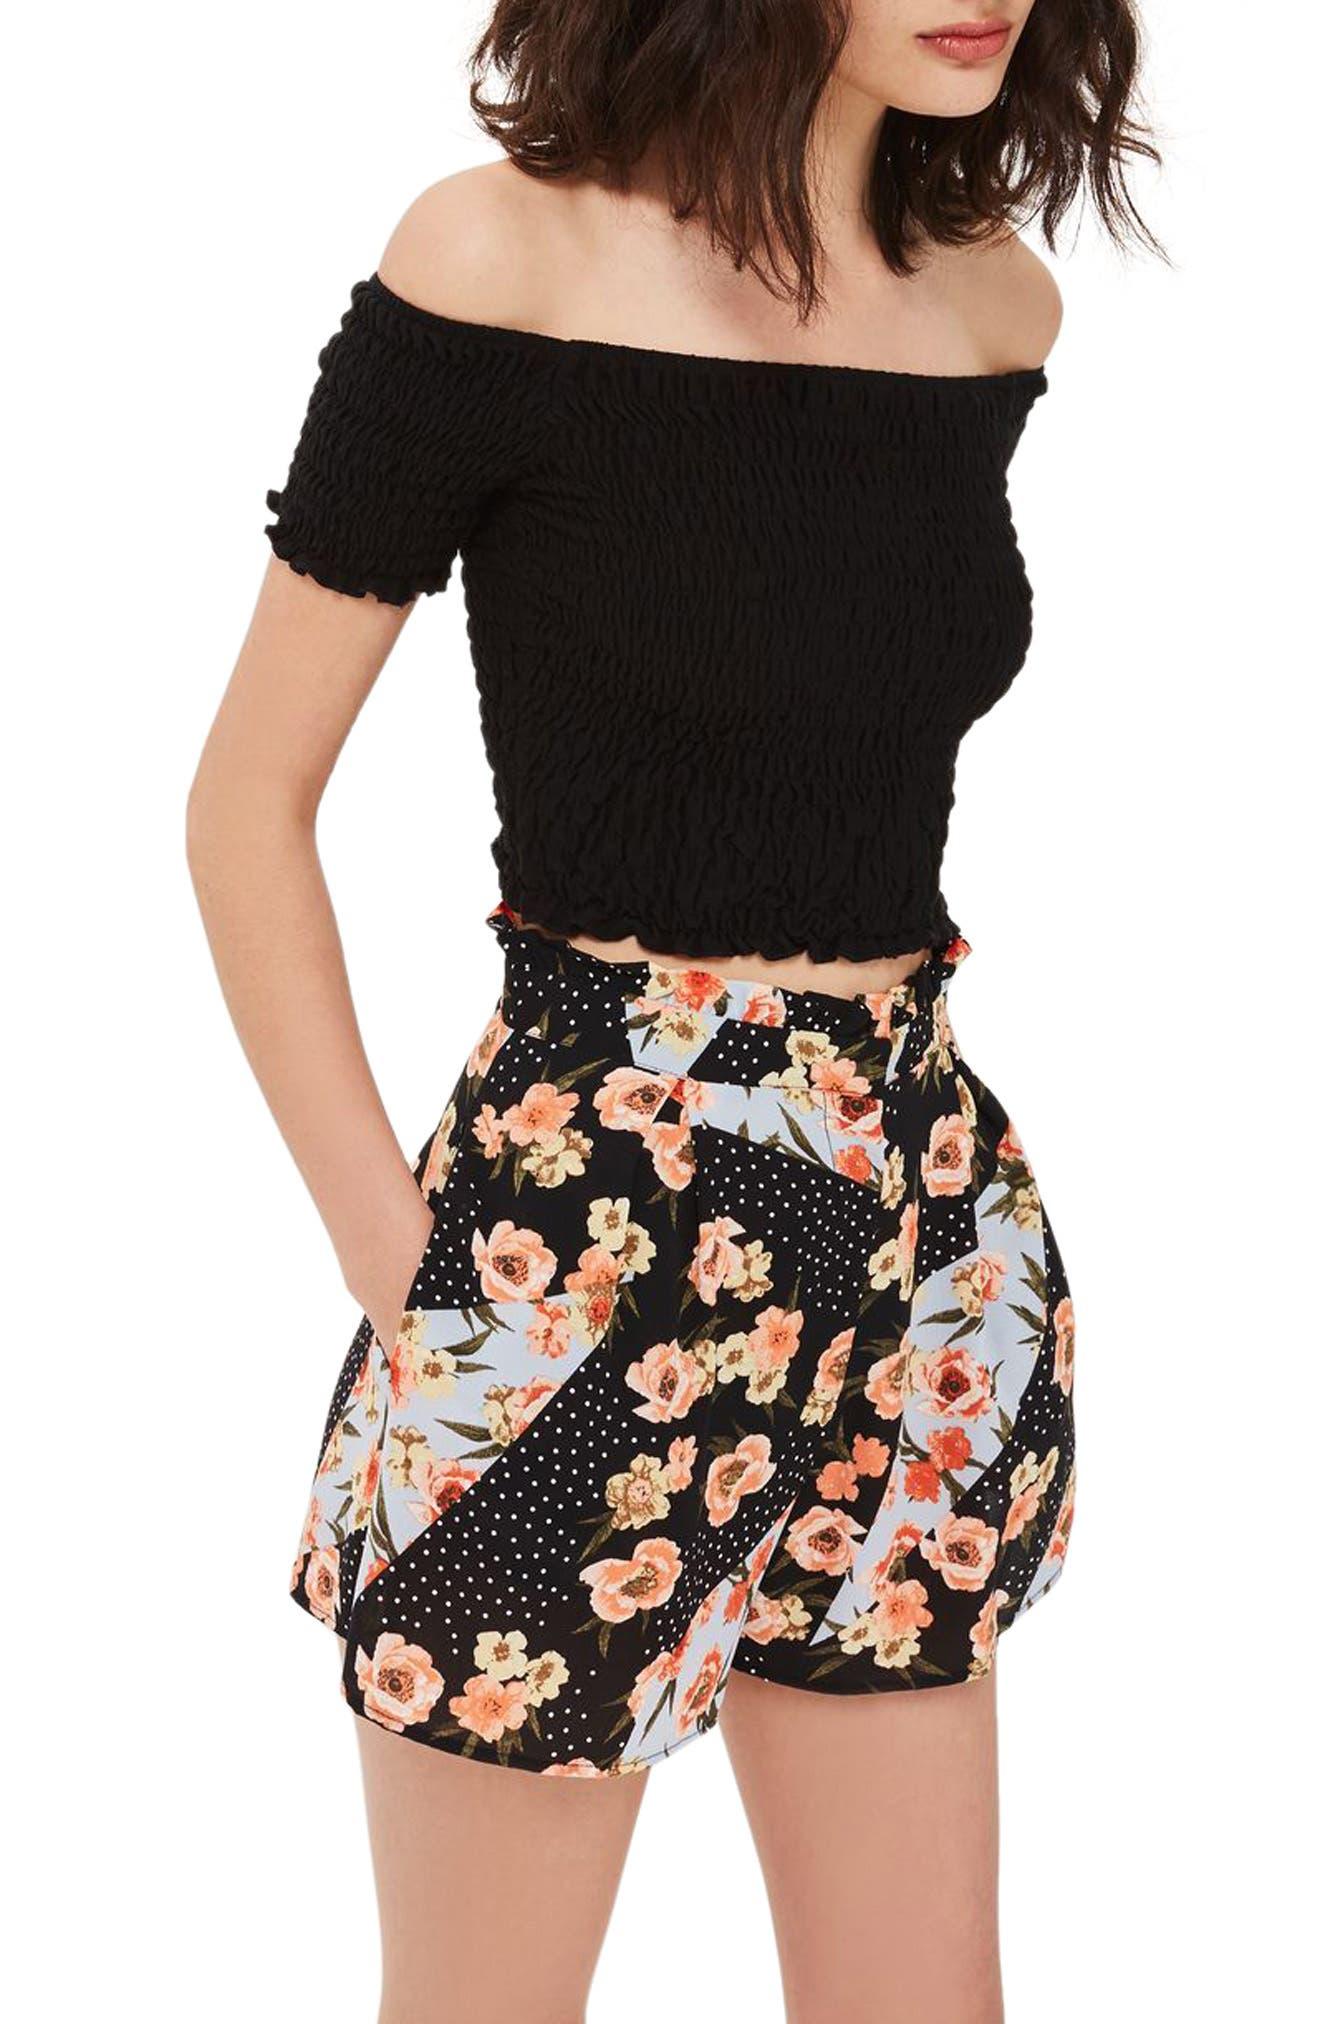 Topshop Pansy & Spot Print Ruffle Waist Shorts